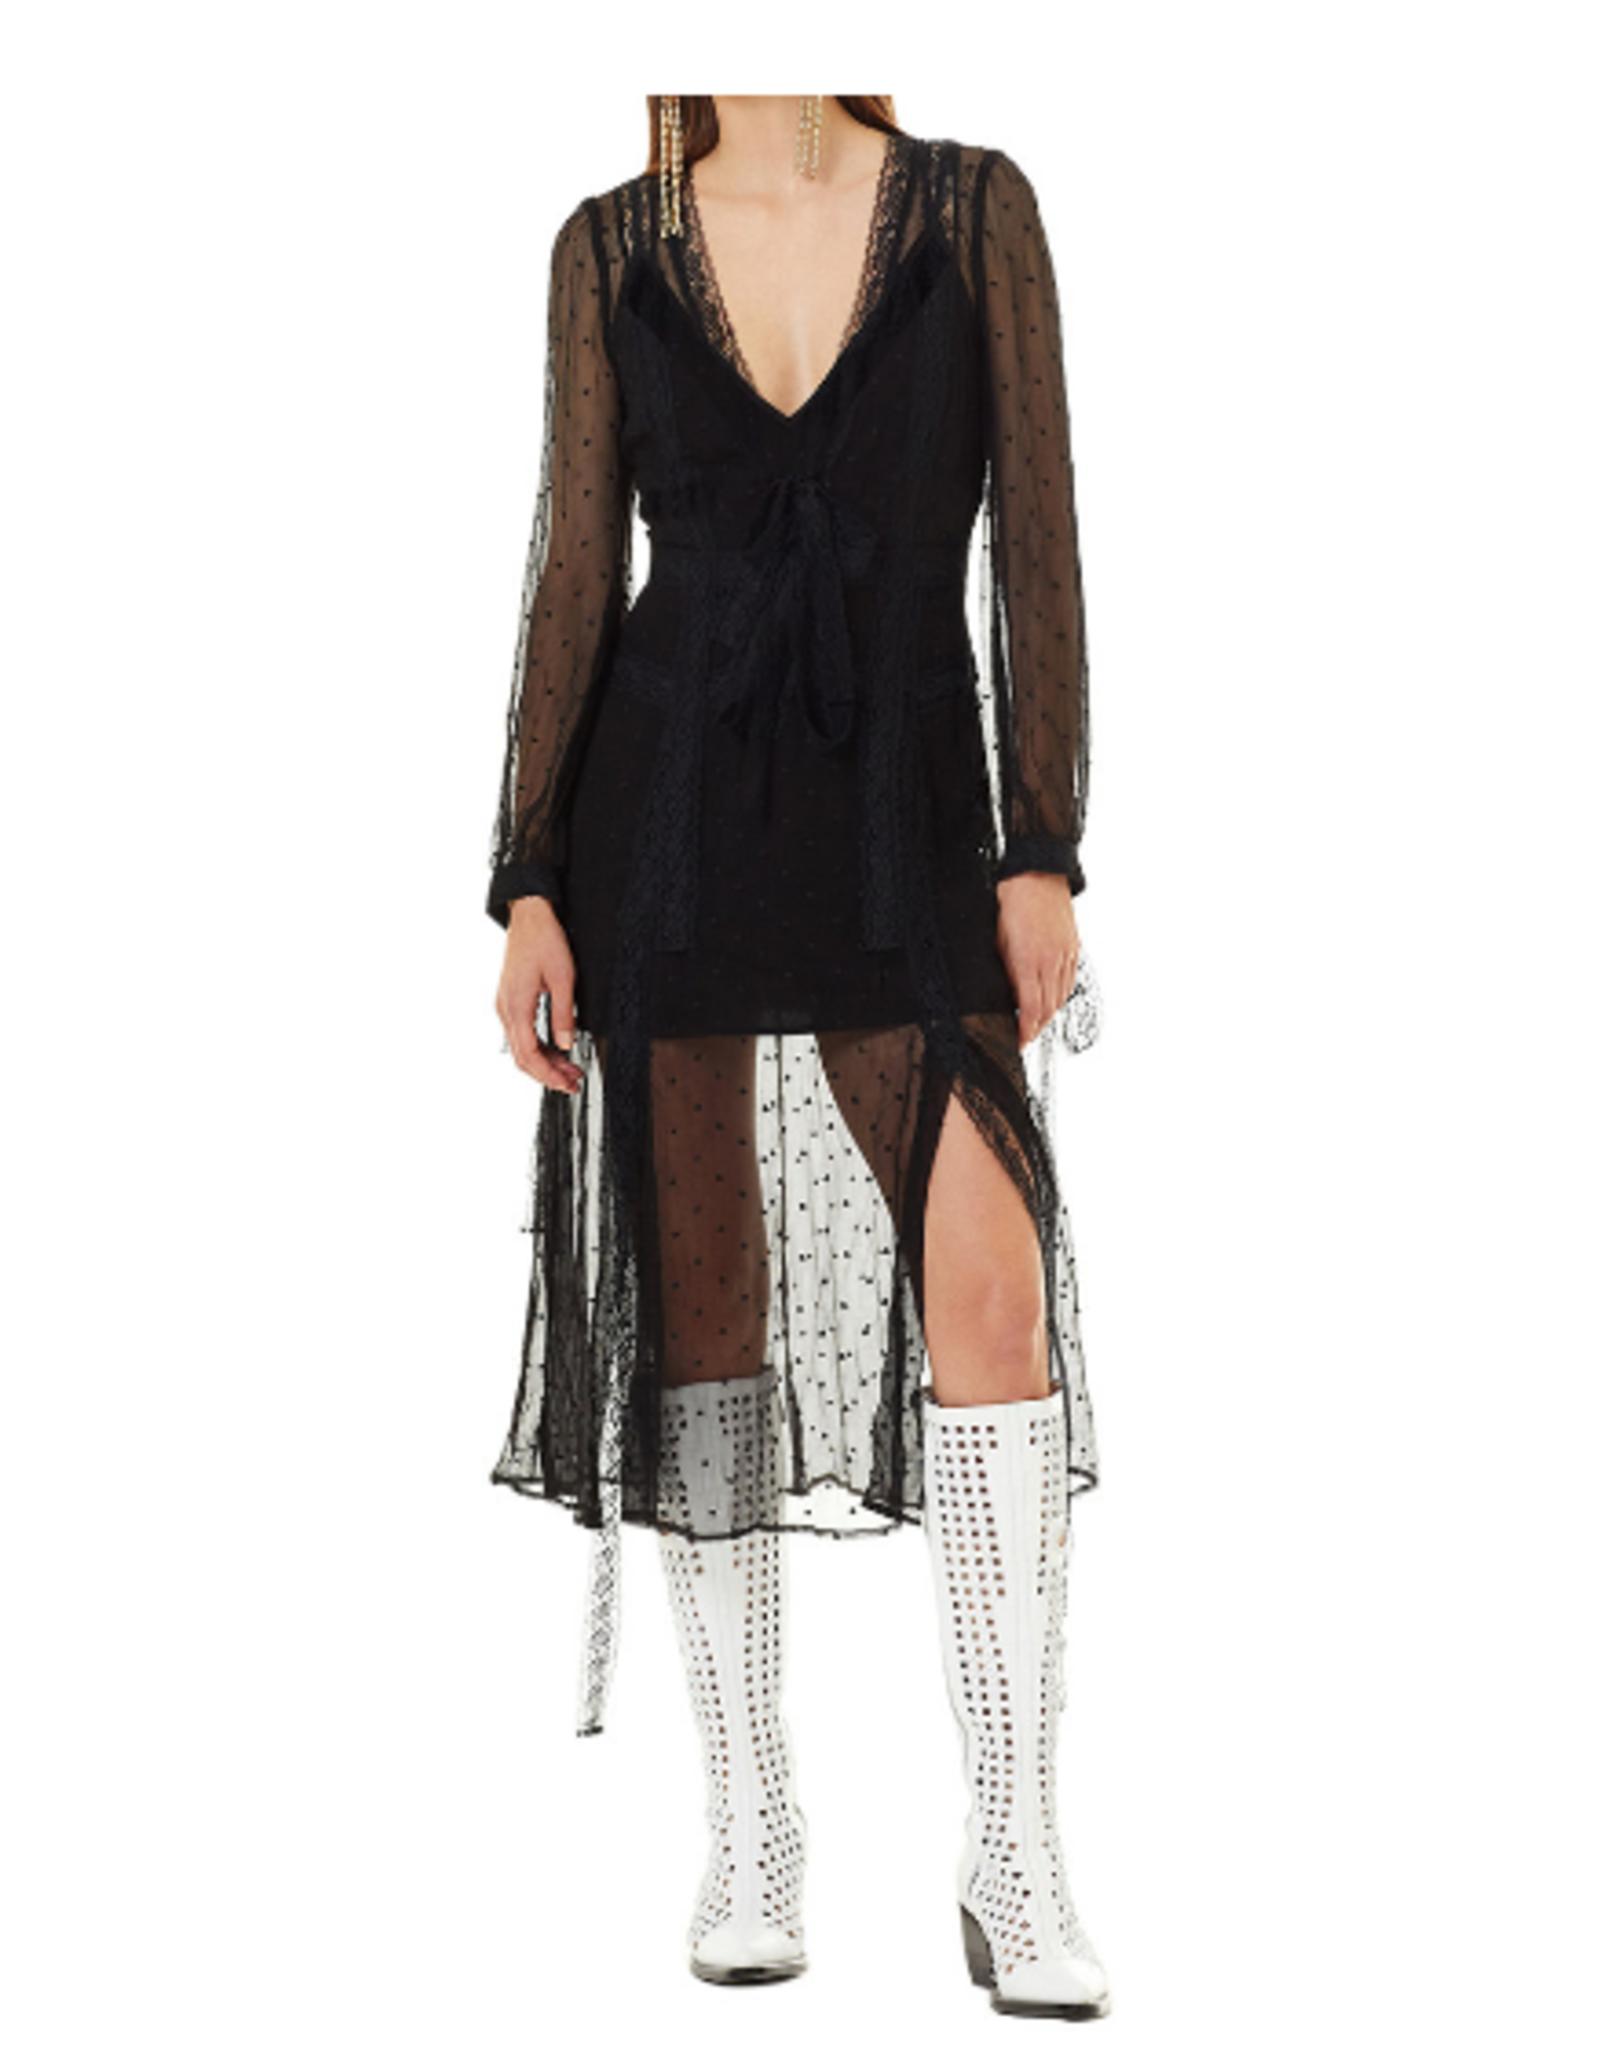 Stevie May Lace Black Midi Dress